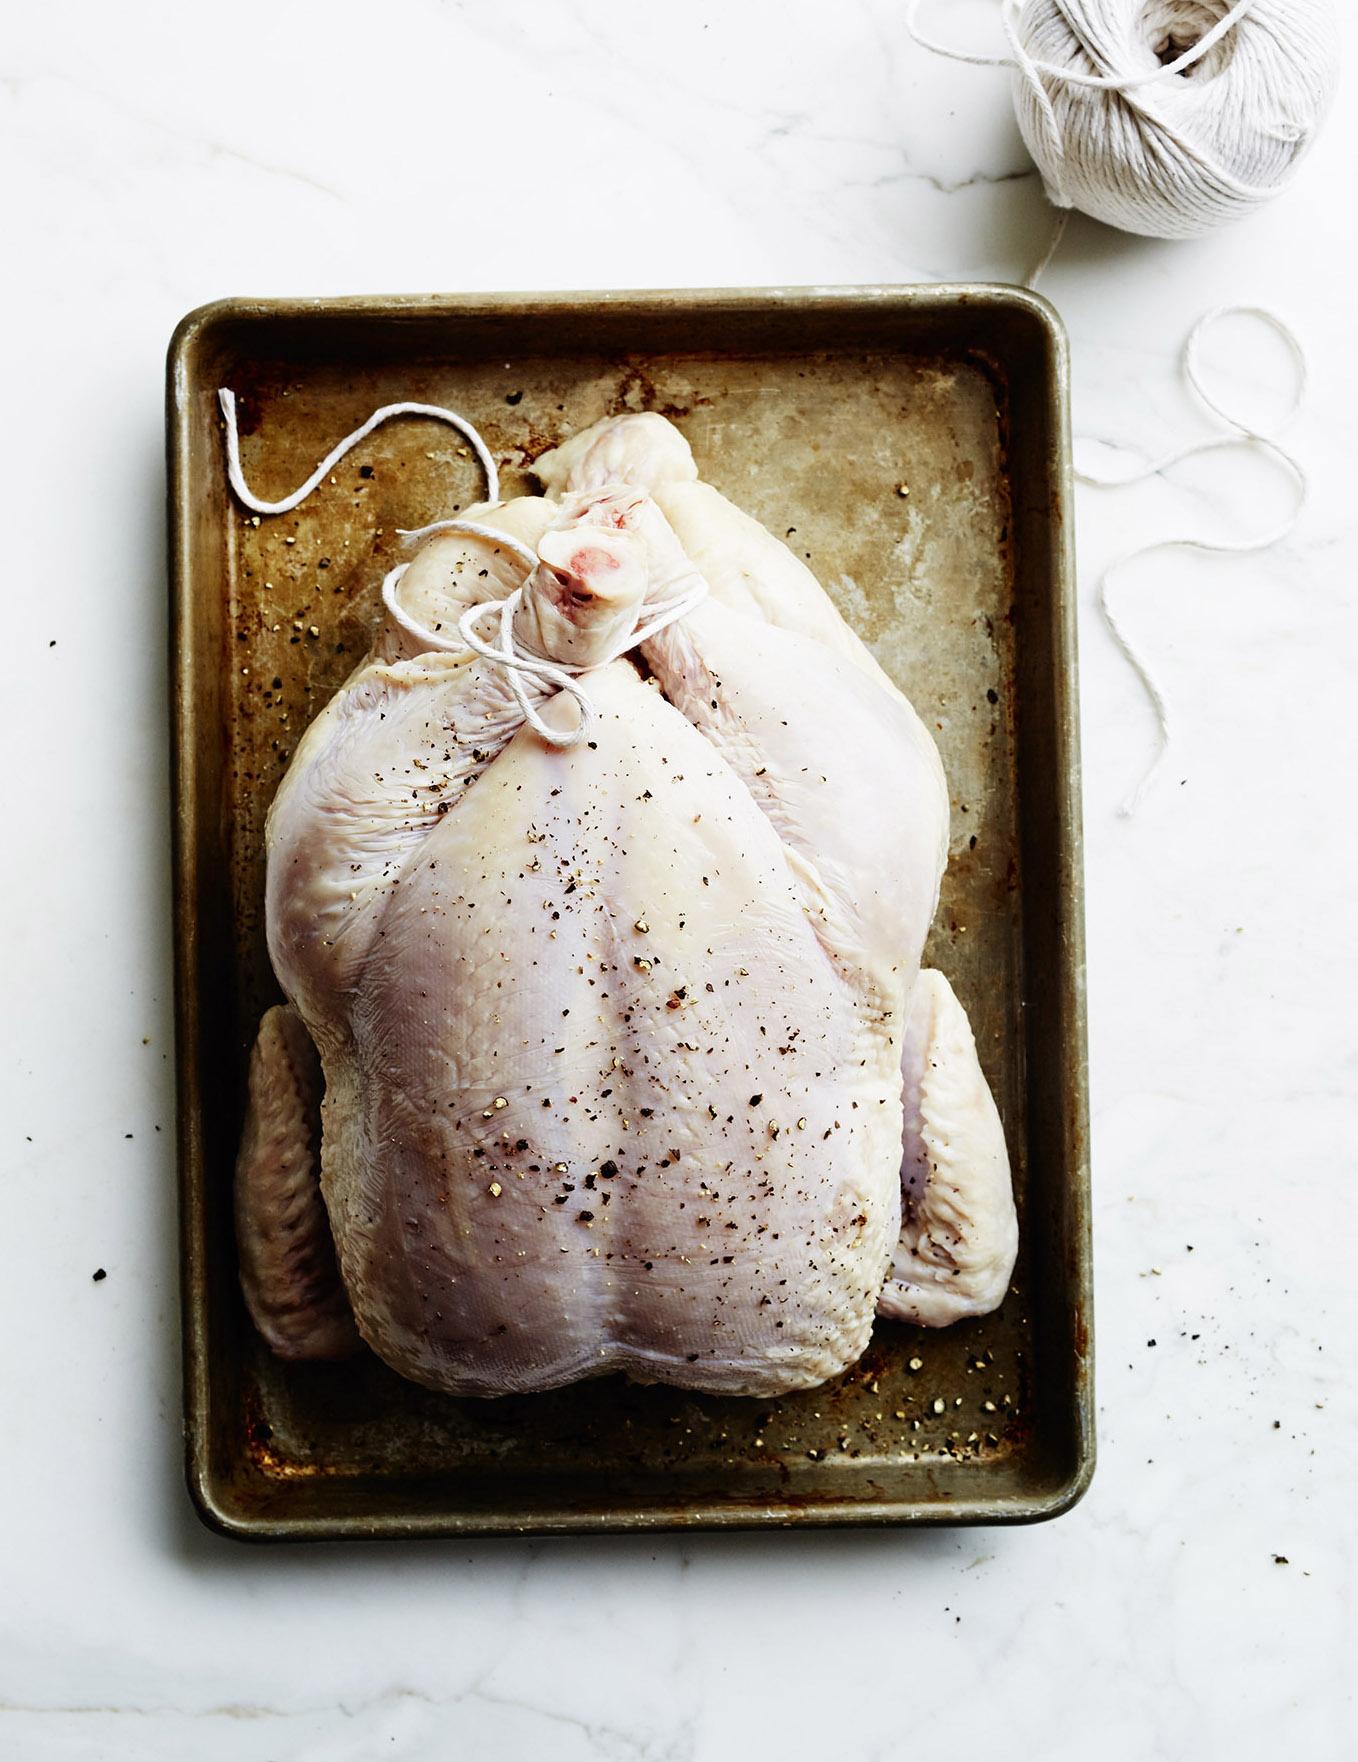 Chicken_8228_final.jpg